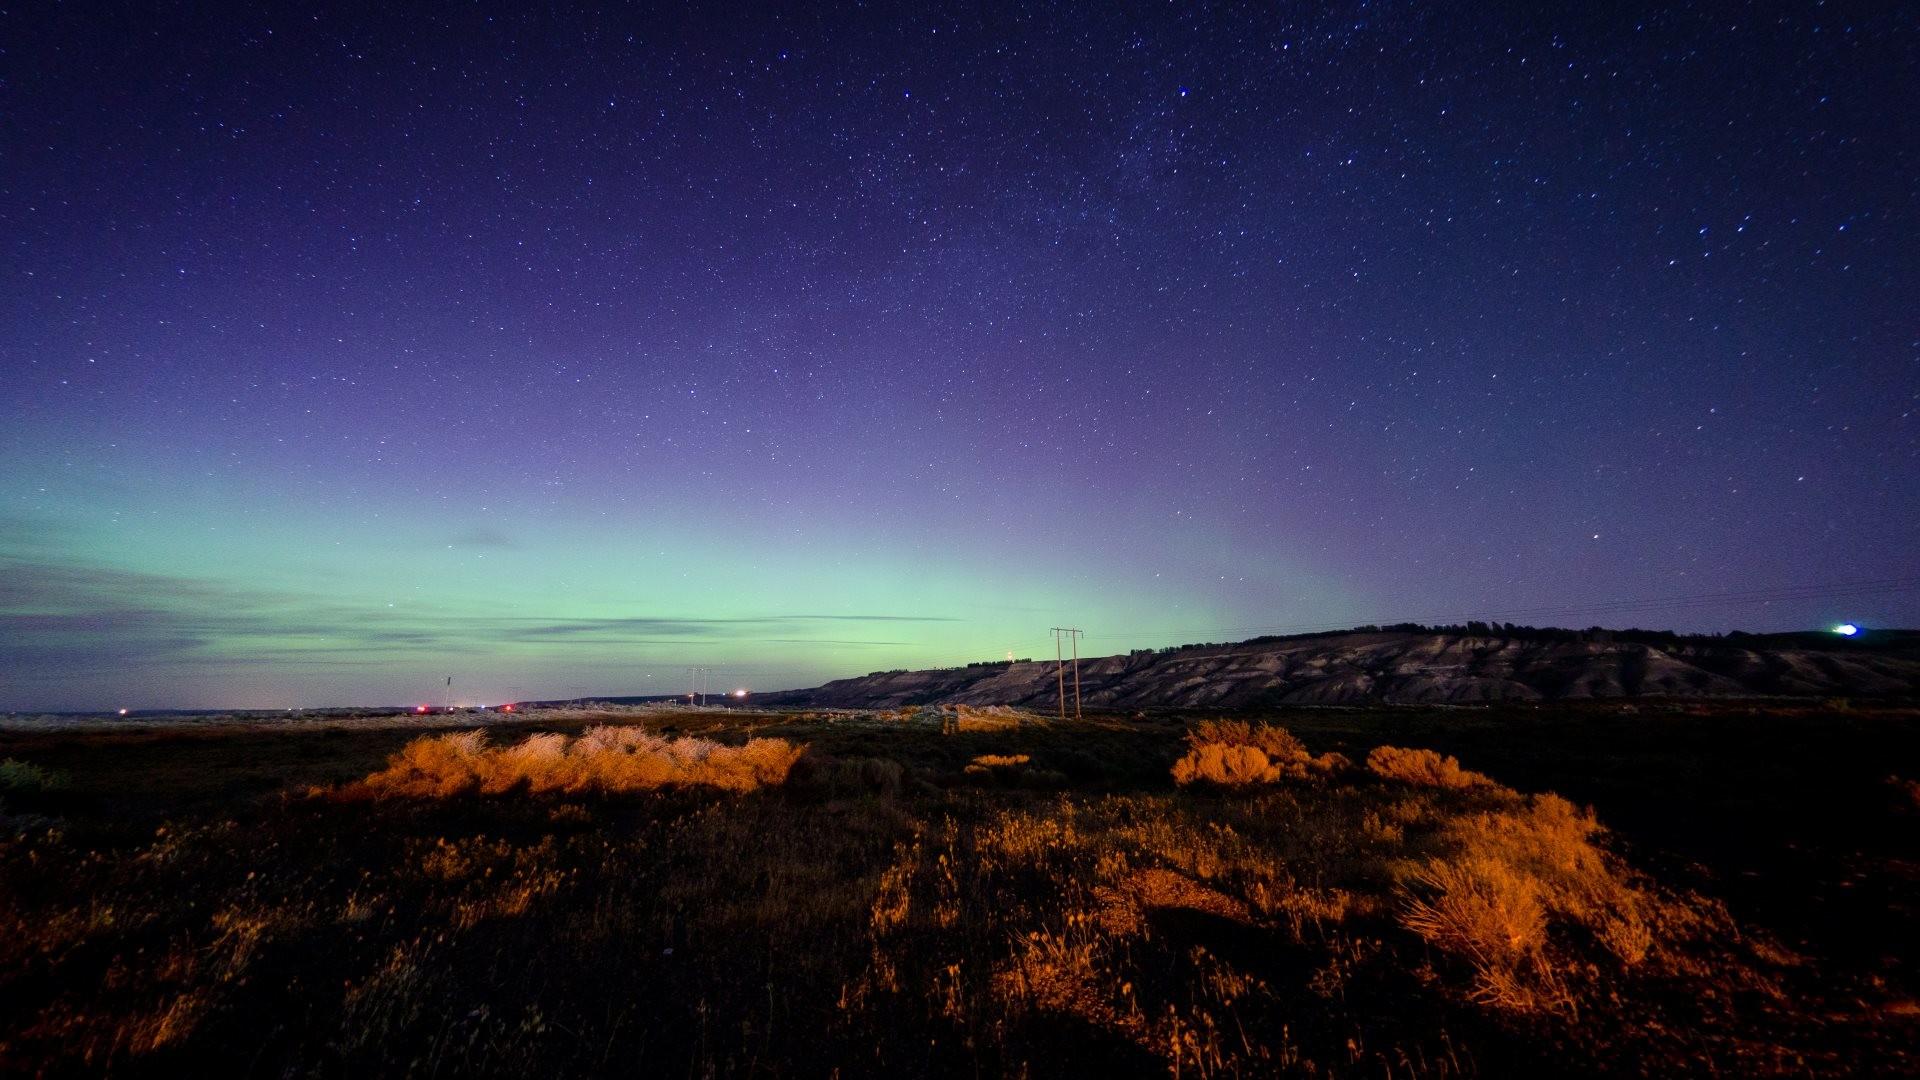 4K HD Wallpaper 2: Aurora Borealis